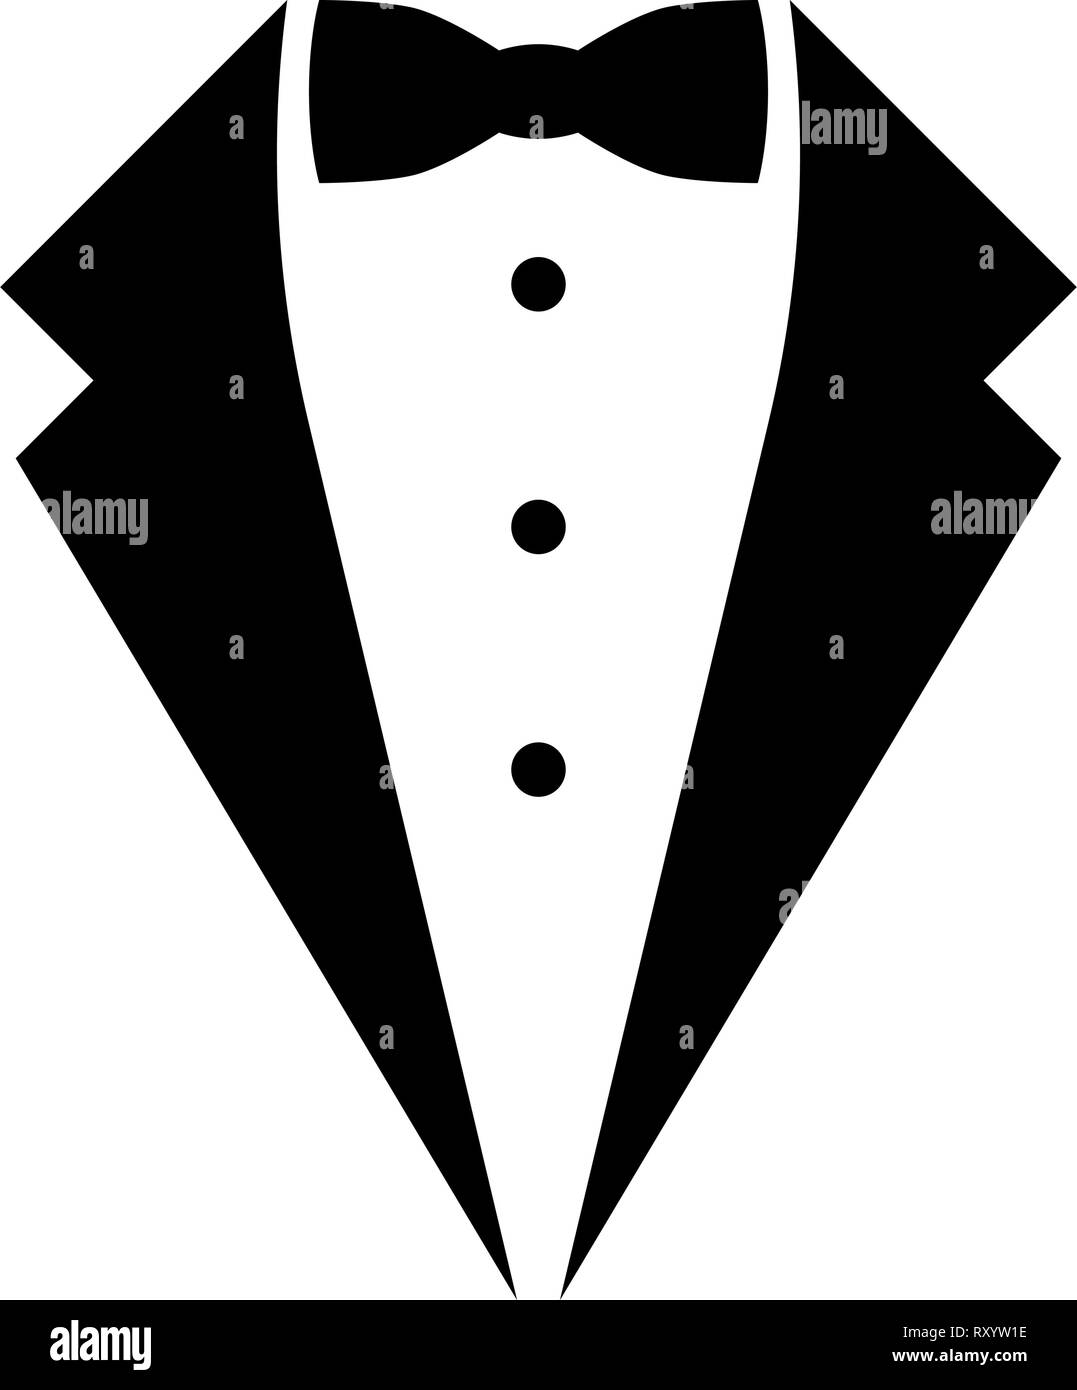 Symbol service dinner jacket bow Tuxedo concept Tux sign Butler gentleman idea Waiter suit icon black color vector illustration flat style simple imag - Stock Image